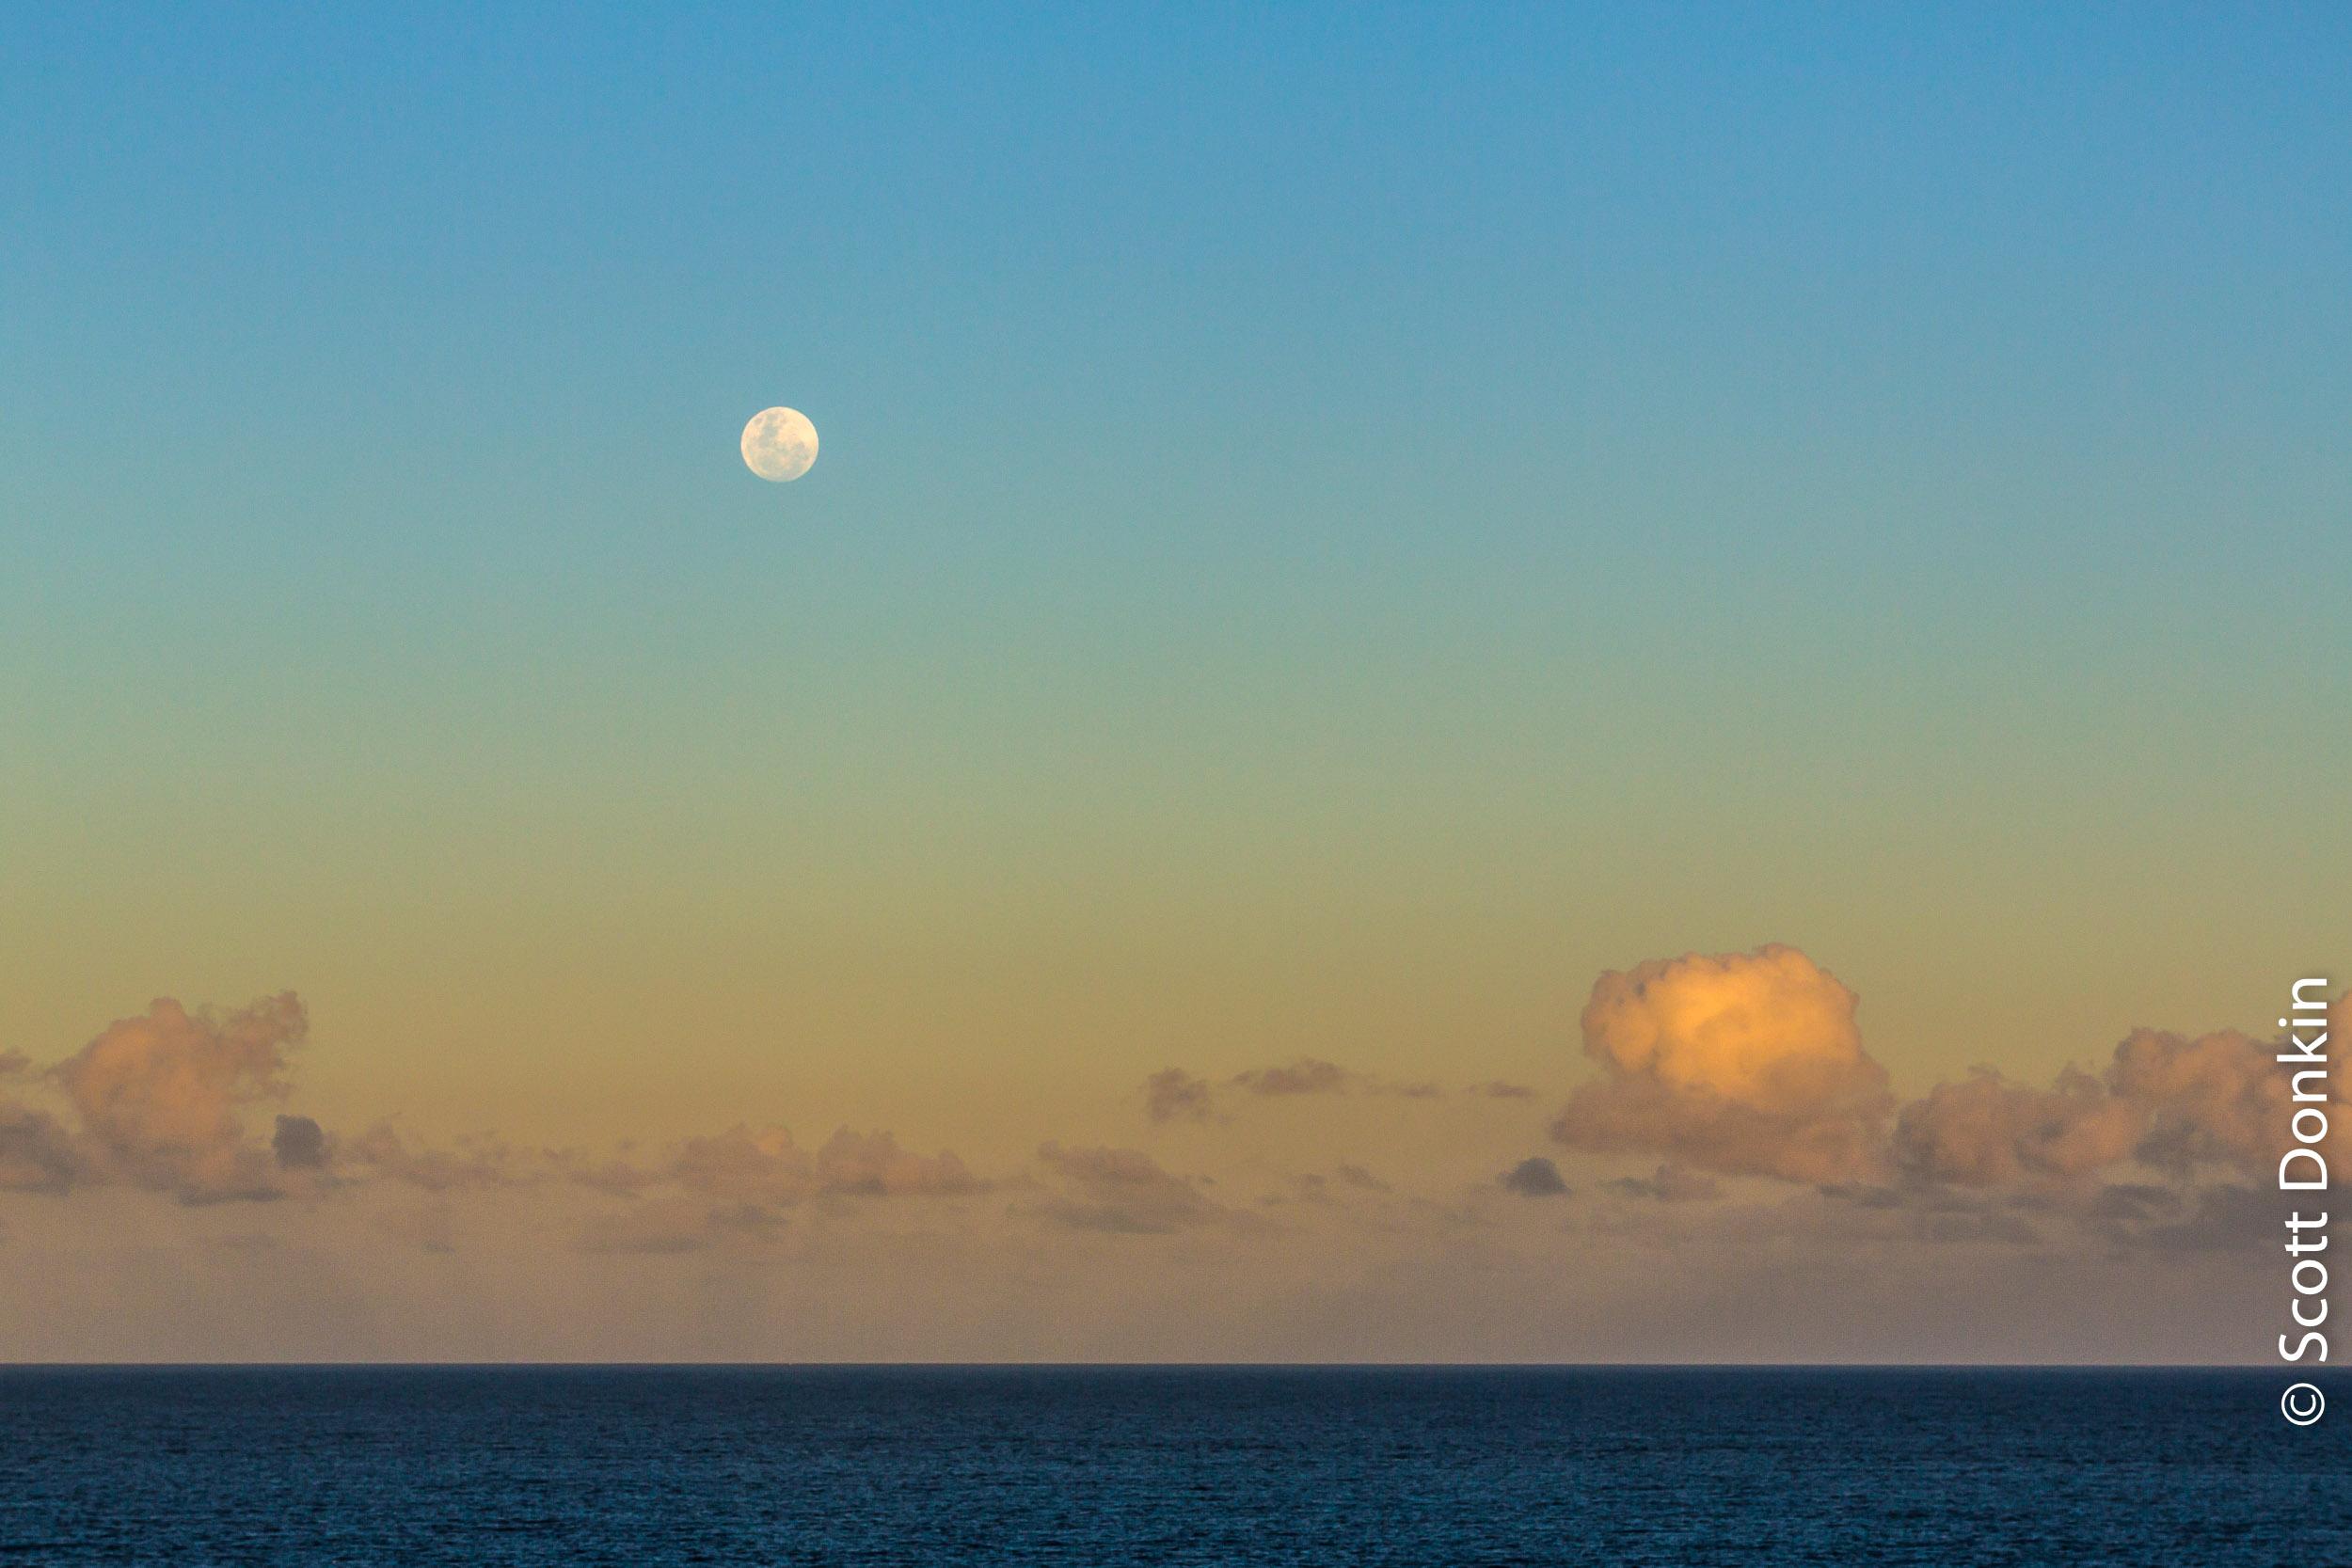 Moonrise. Sufers Paradise, Qld. Dusk, 13 December 2016.